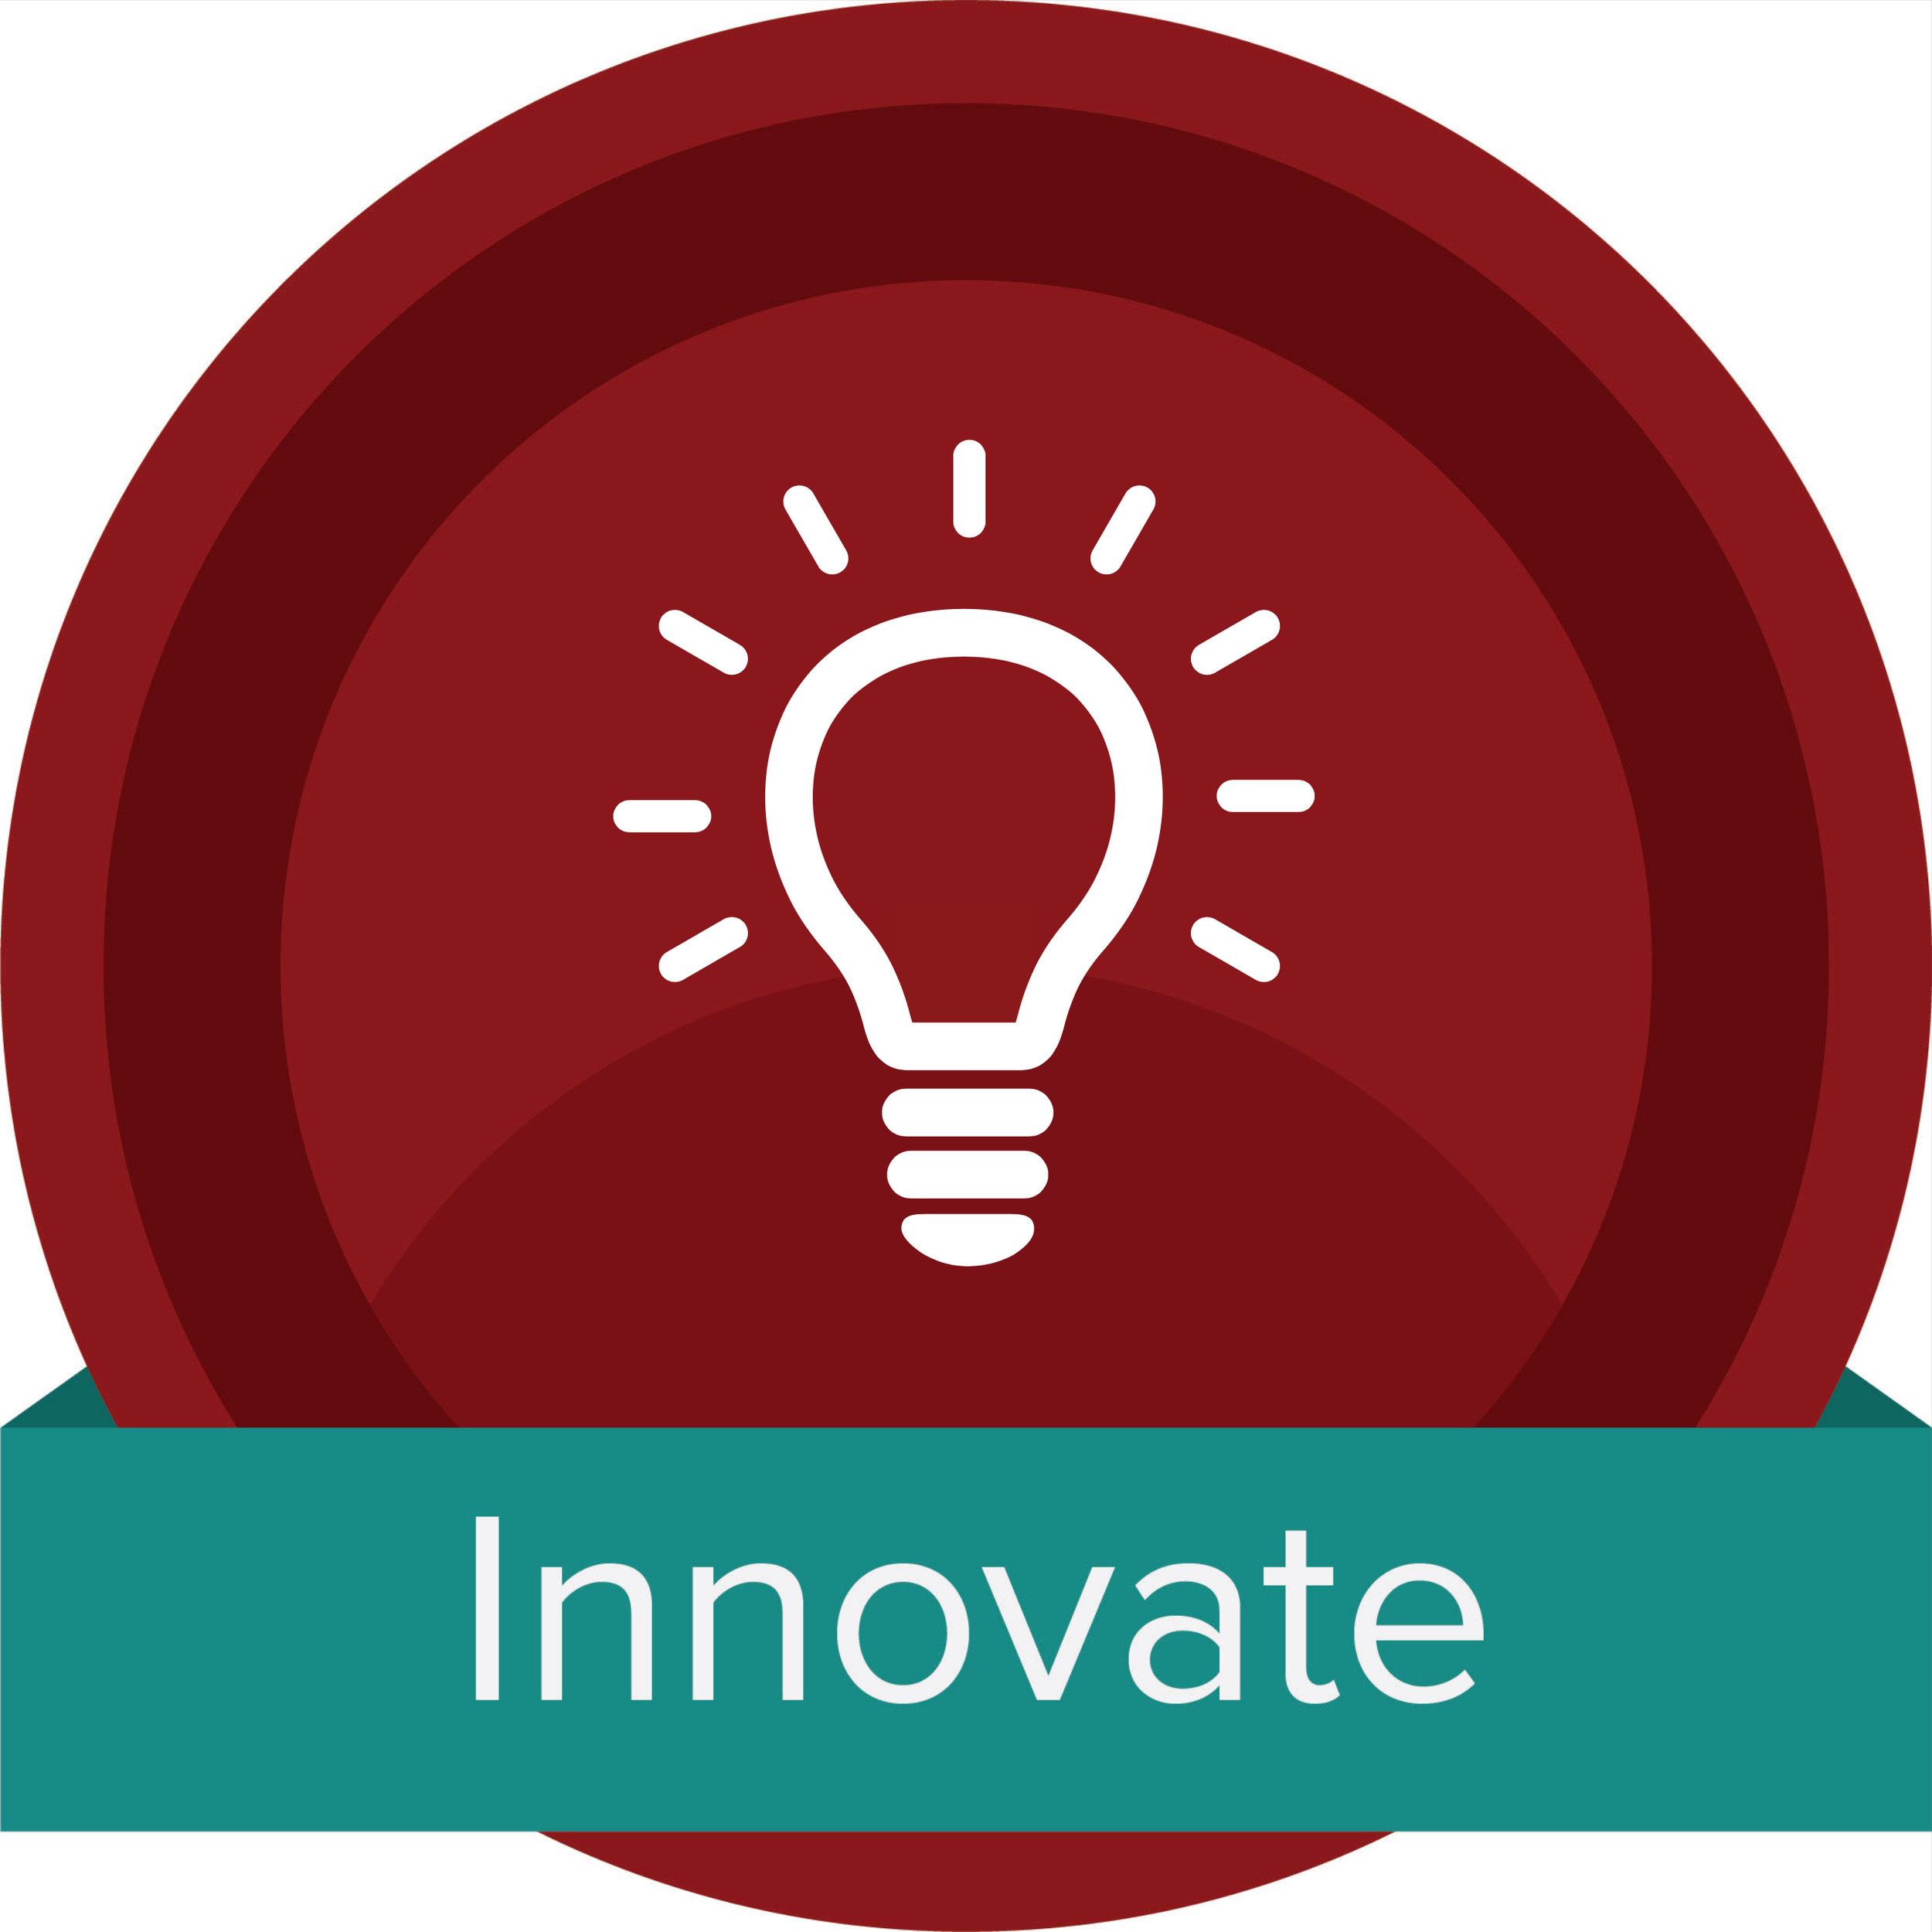 innovate1.jpg